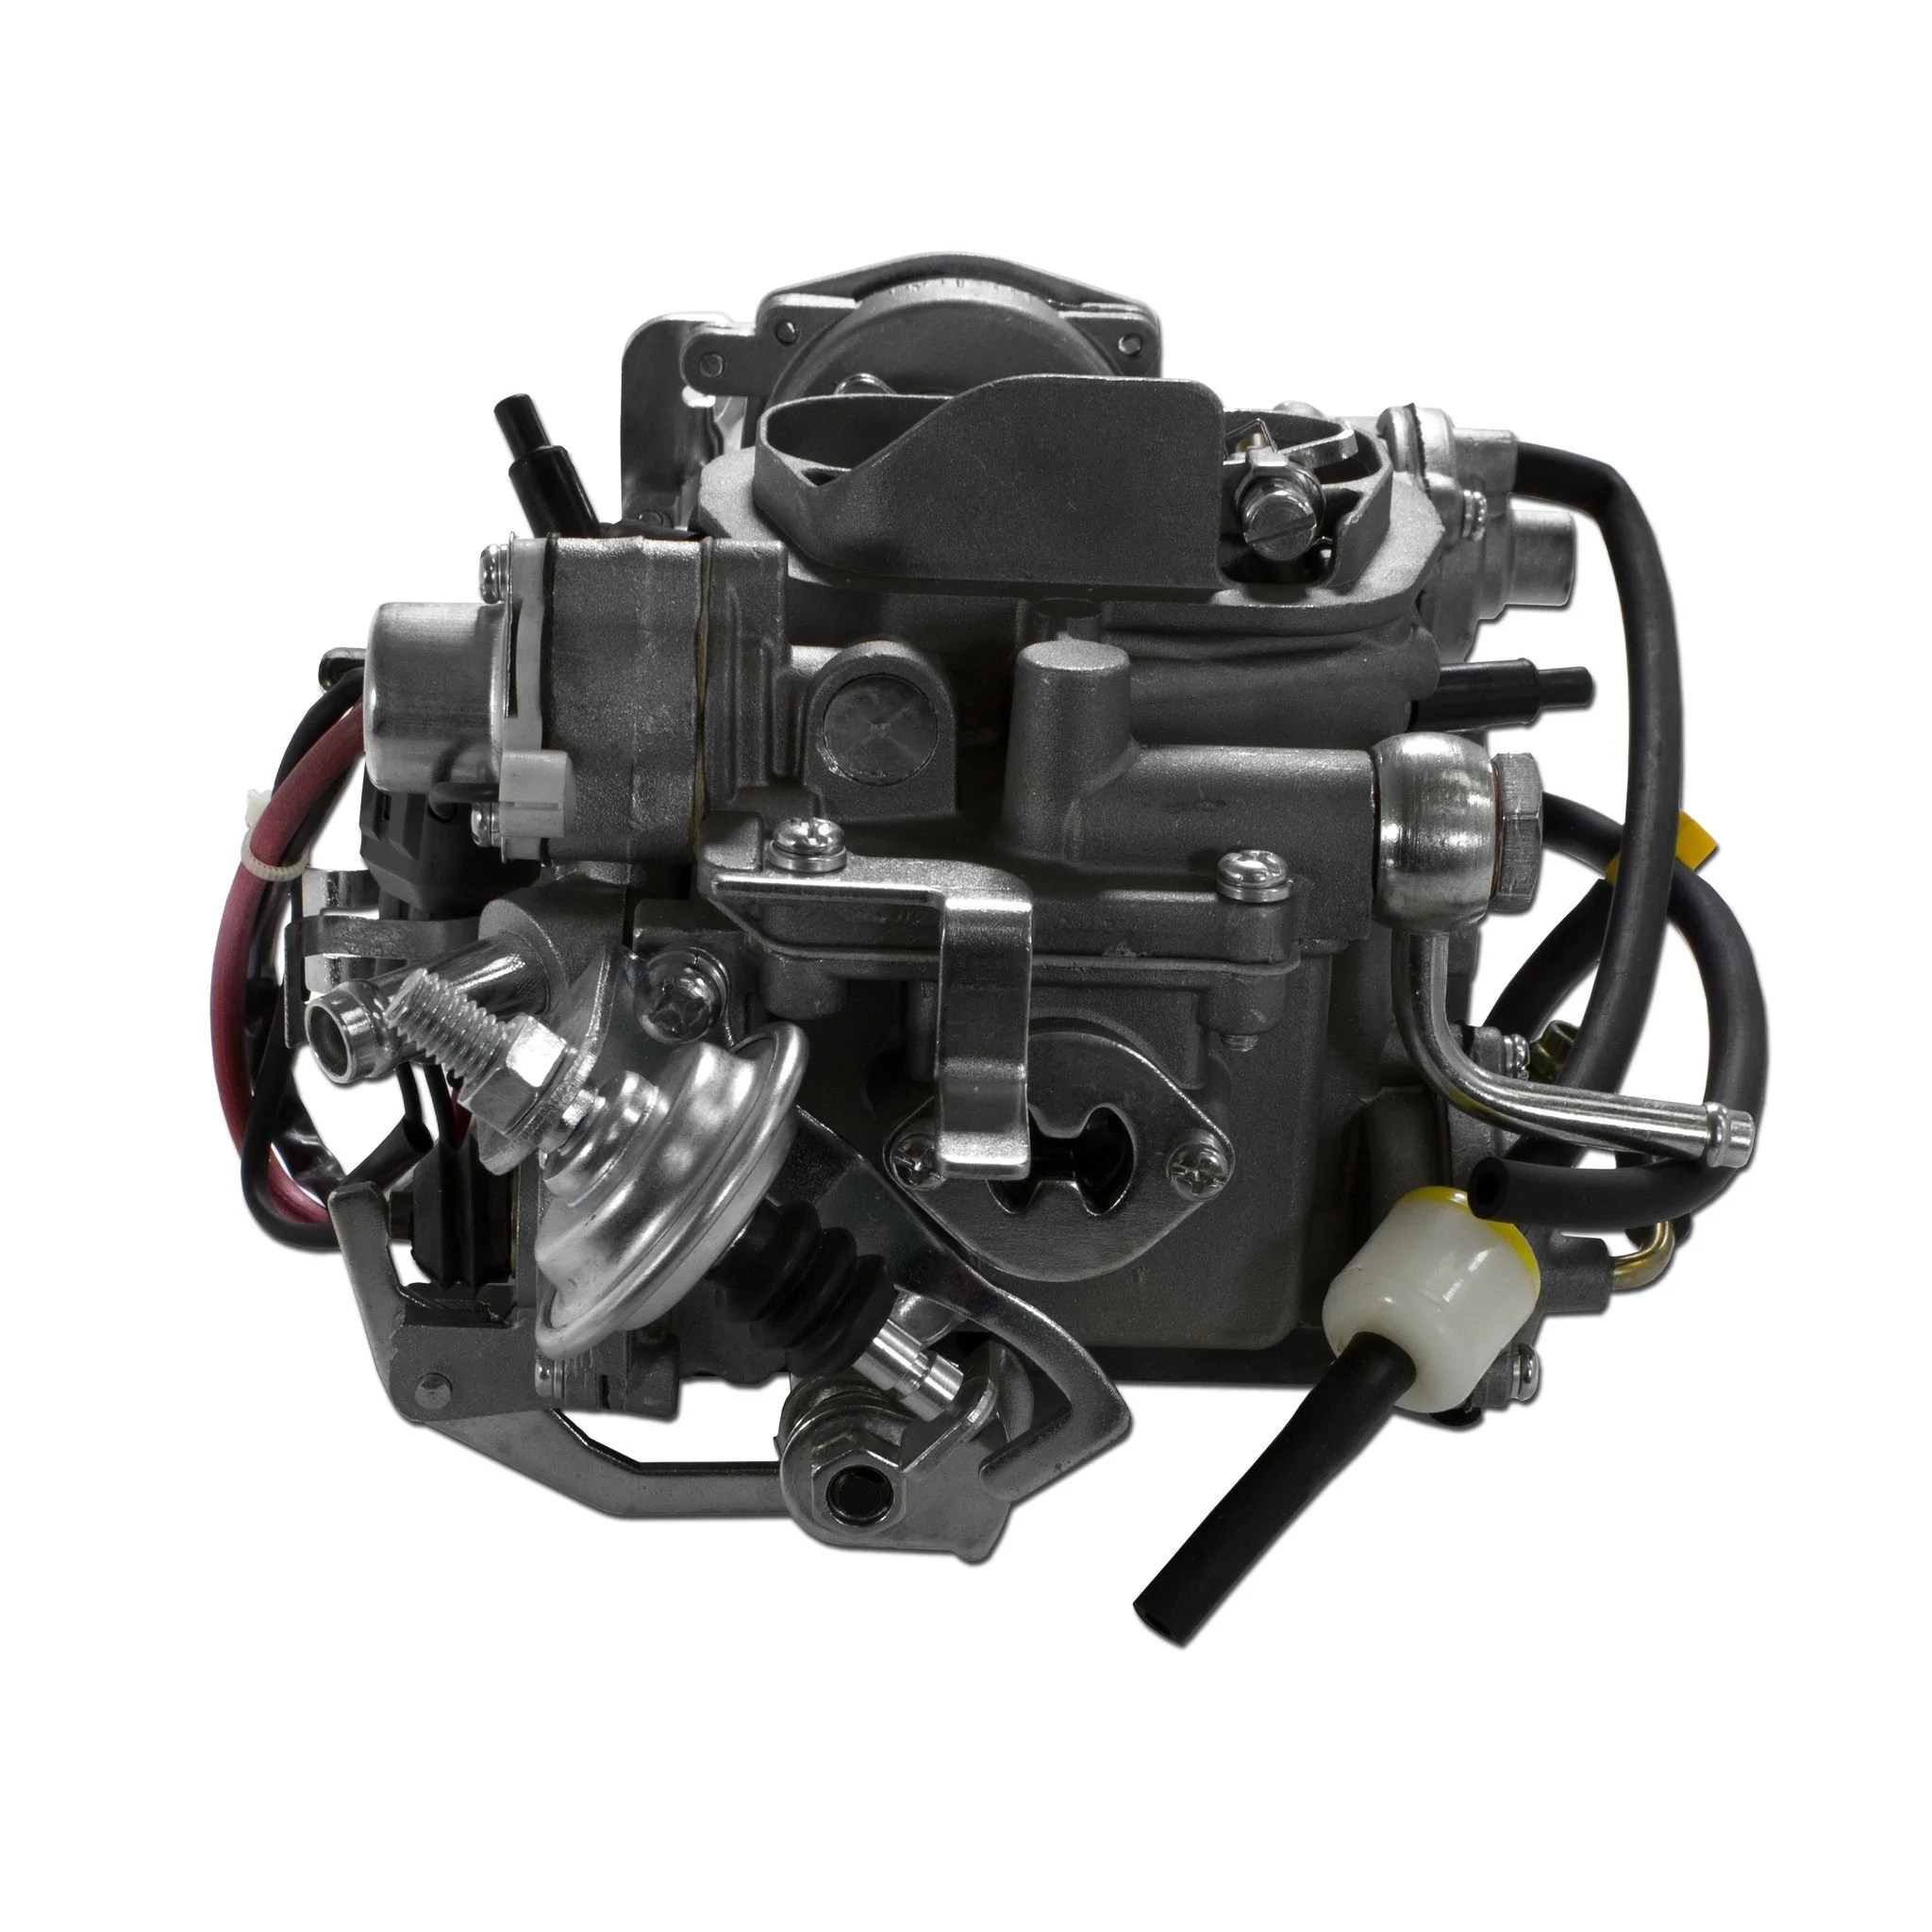 toyota 22r carburetor carb electric choke model 2 21100 35520c  [ 2048 x 2048 Pixel ]